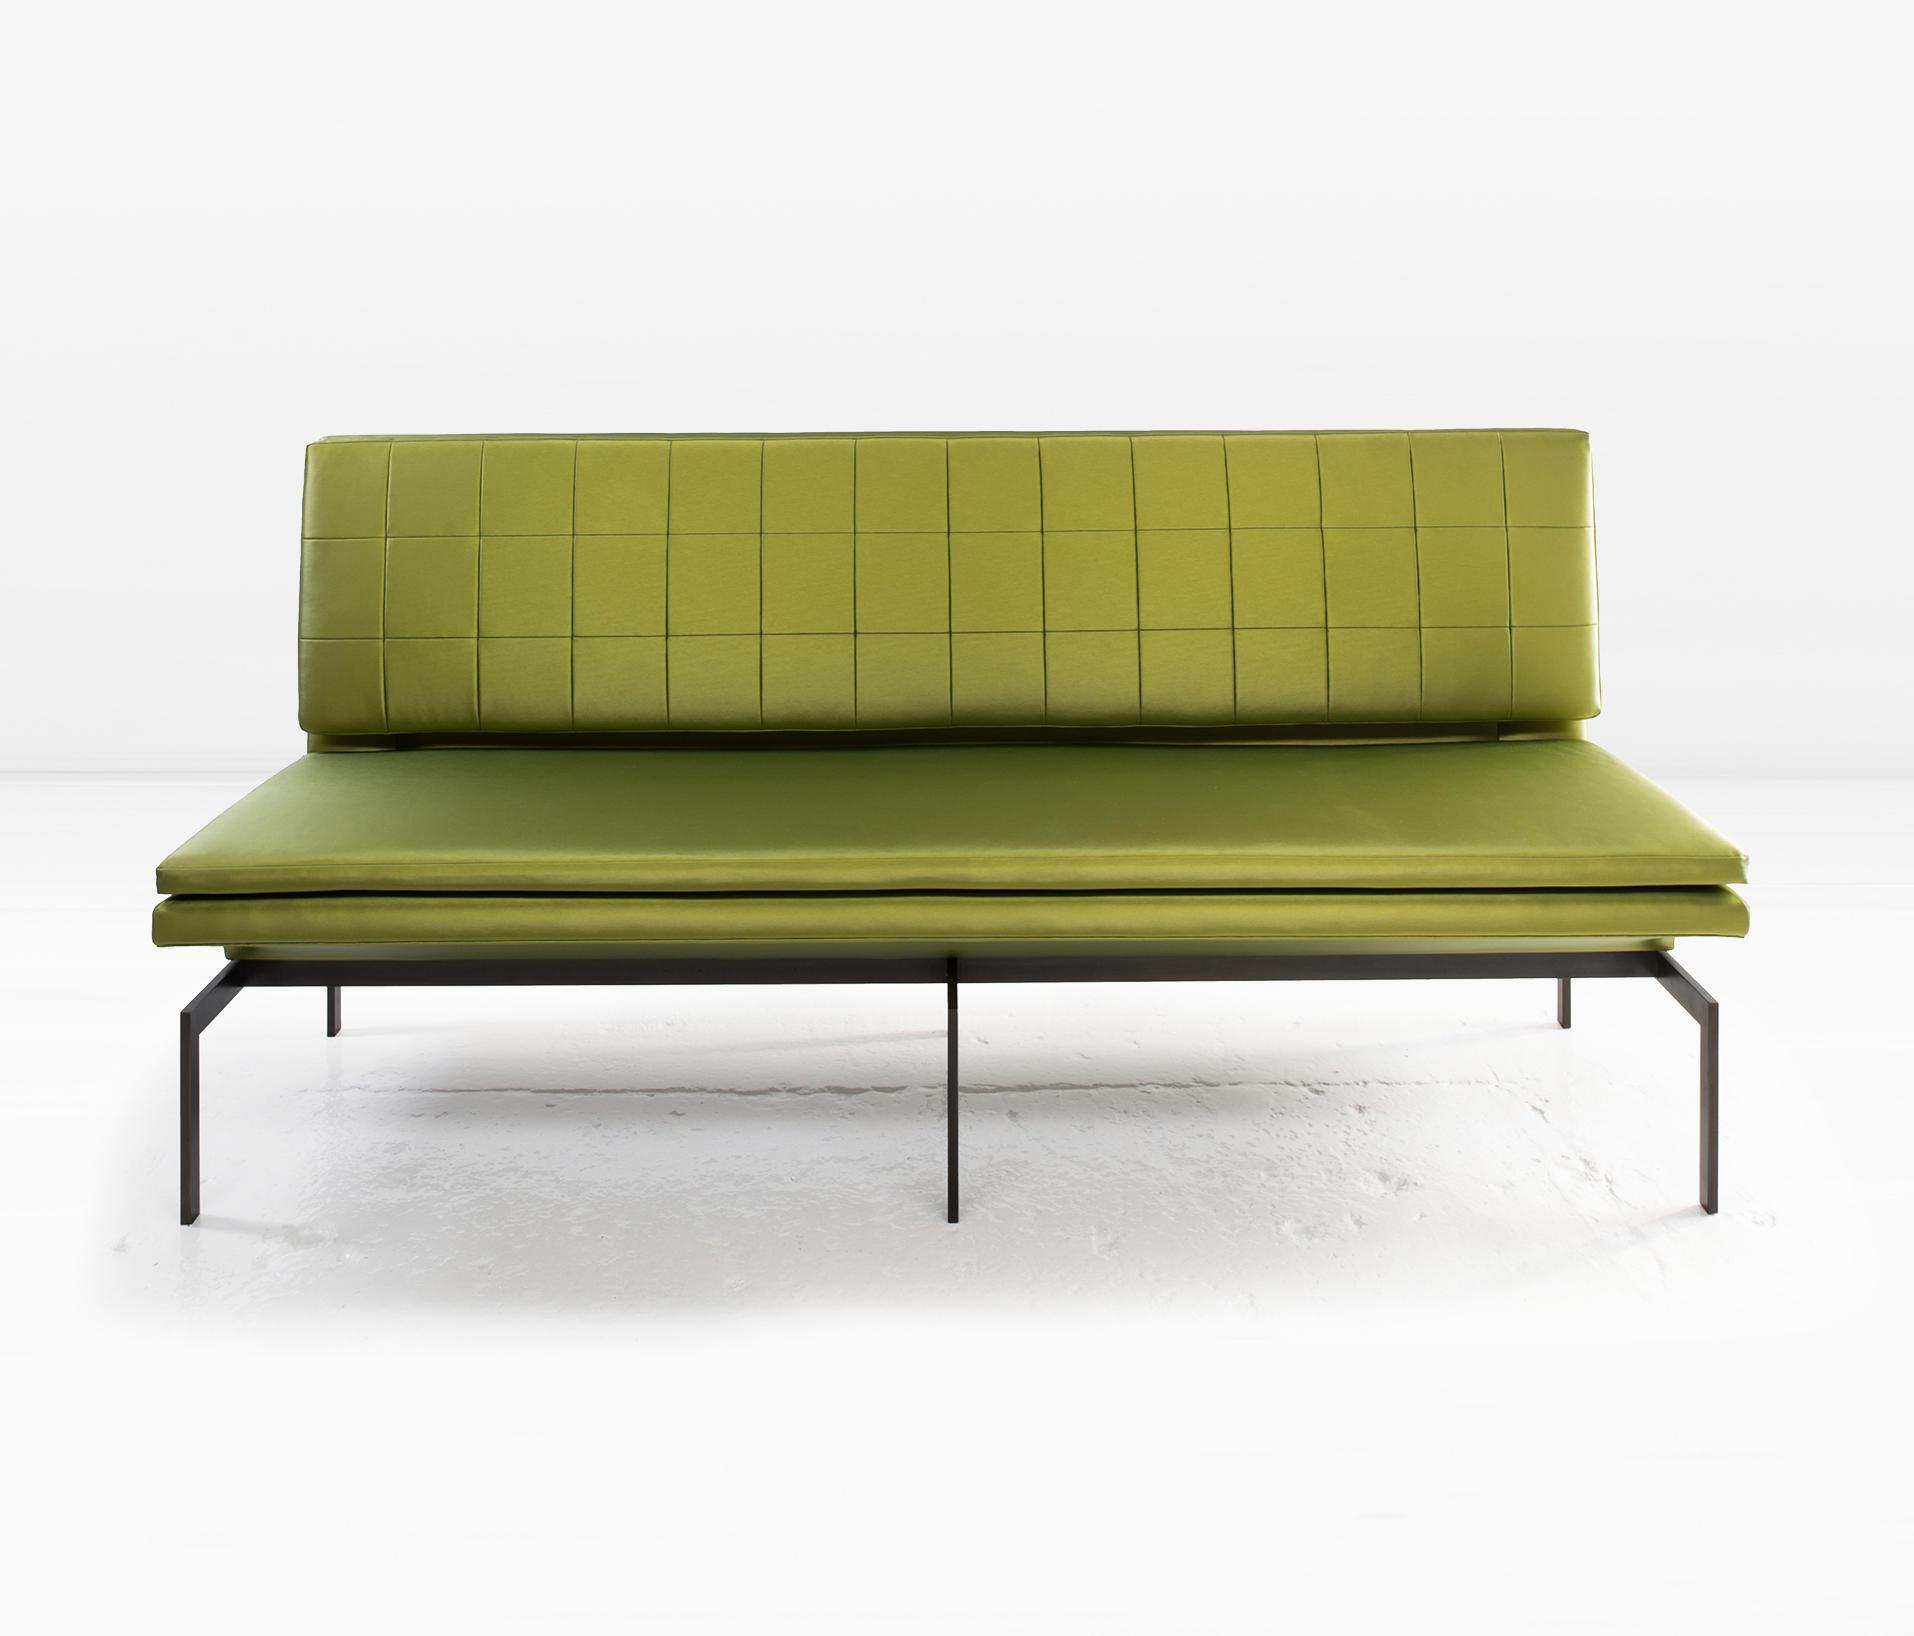 ... Mancini Banquette By Khouri Guzman Bunce Lininger | Waiting Area Benches